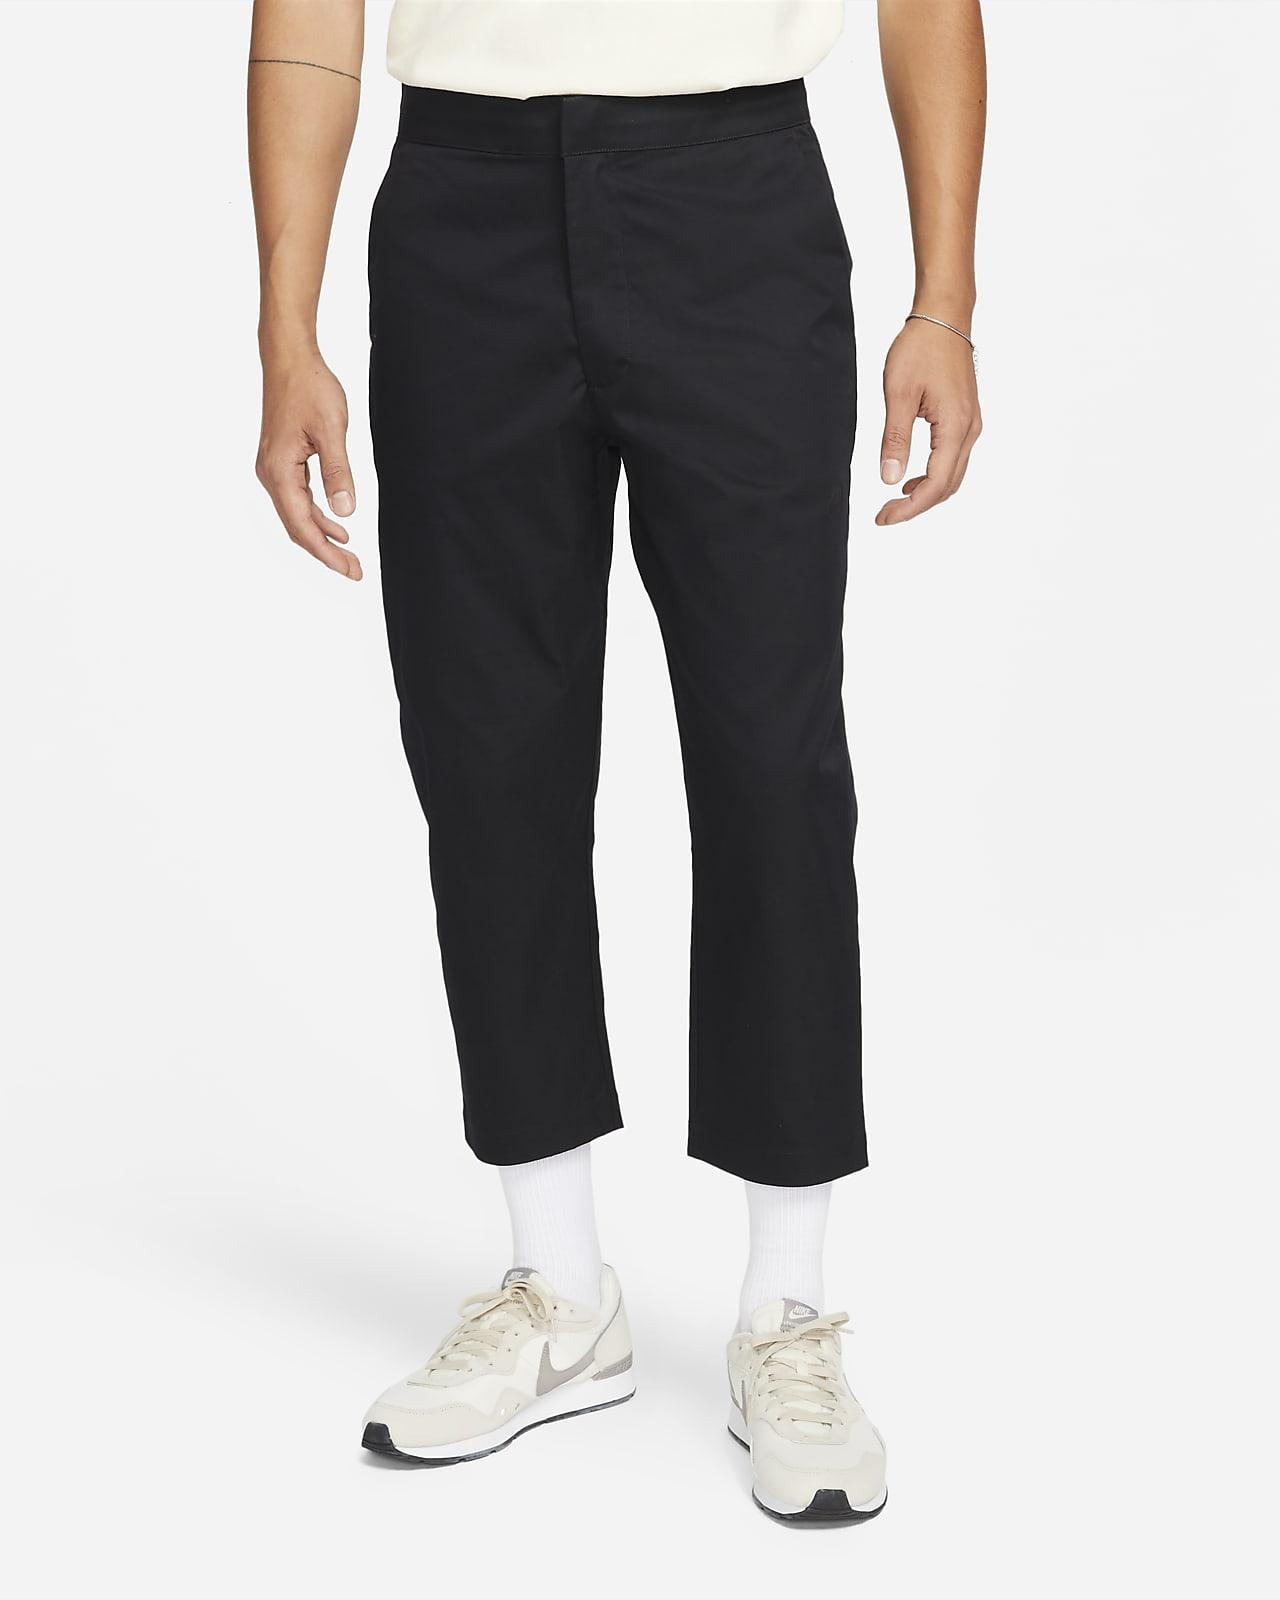 Nike Sportswear Style Essentials 男子梭织无衬里运动长裤